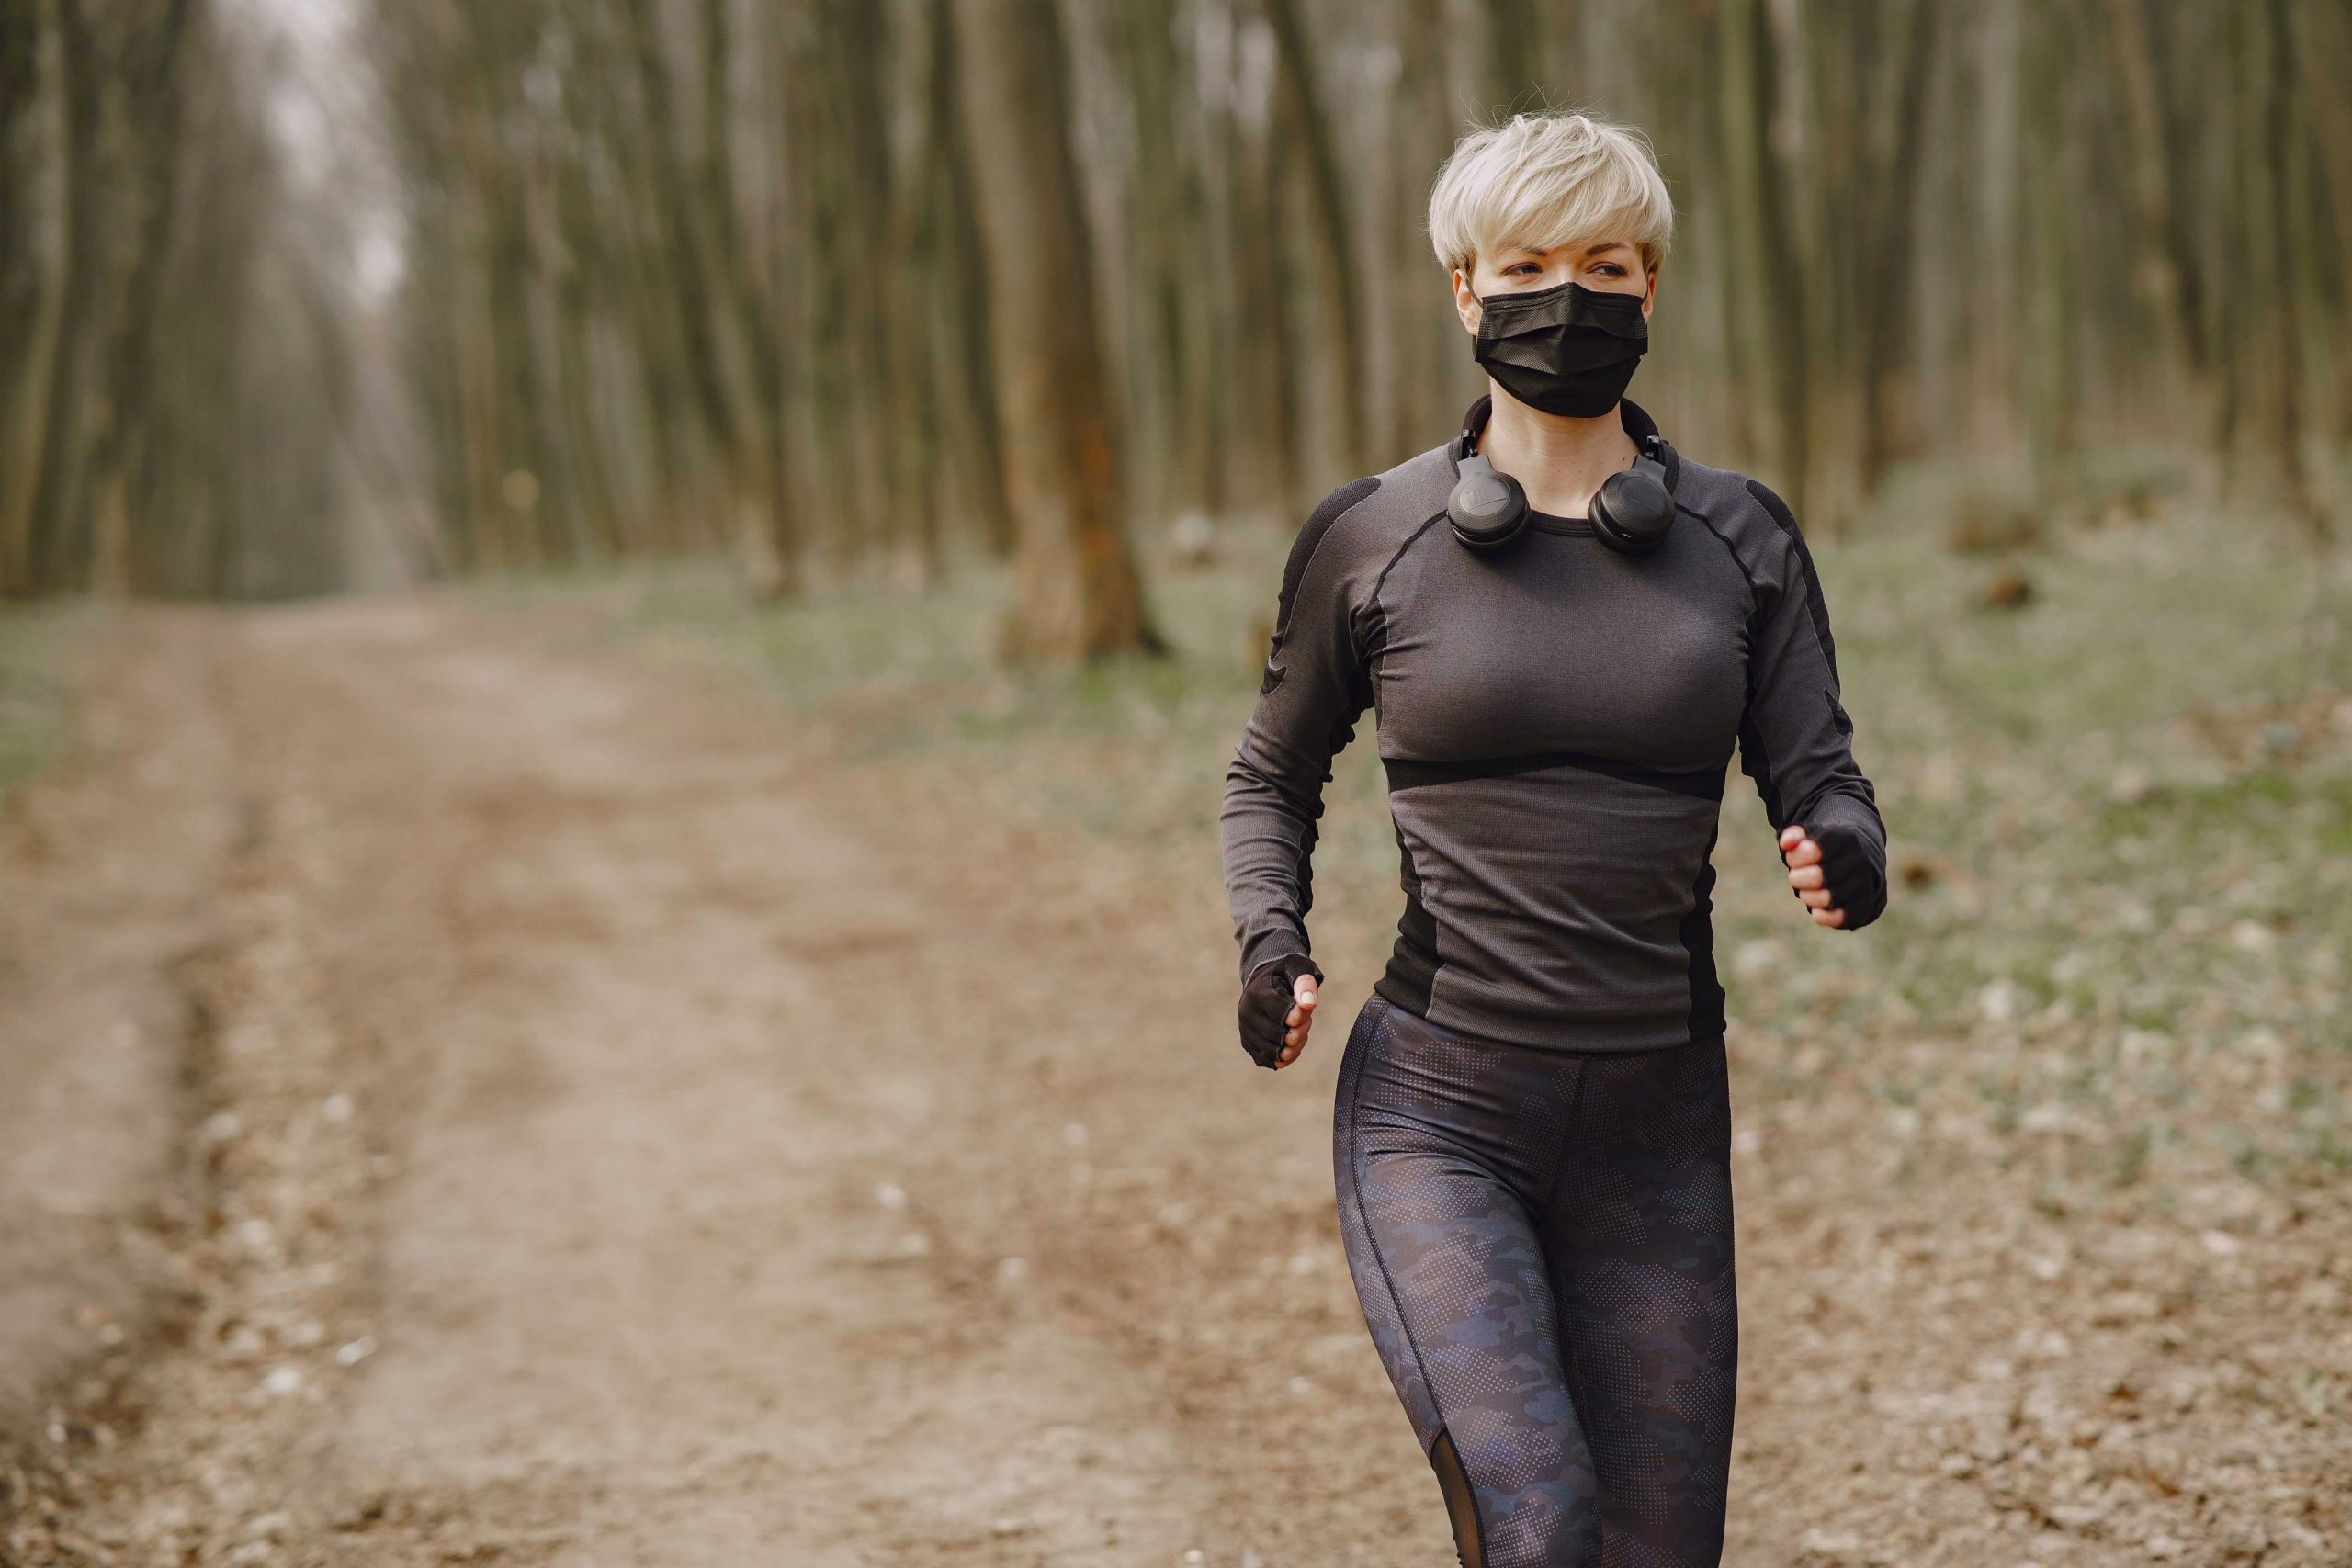 masked-woman-training-during-coronavirus